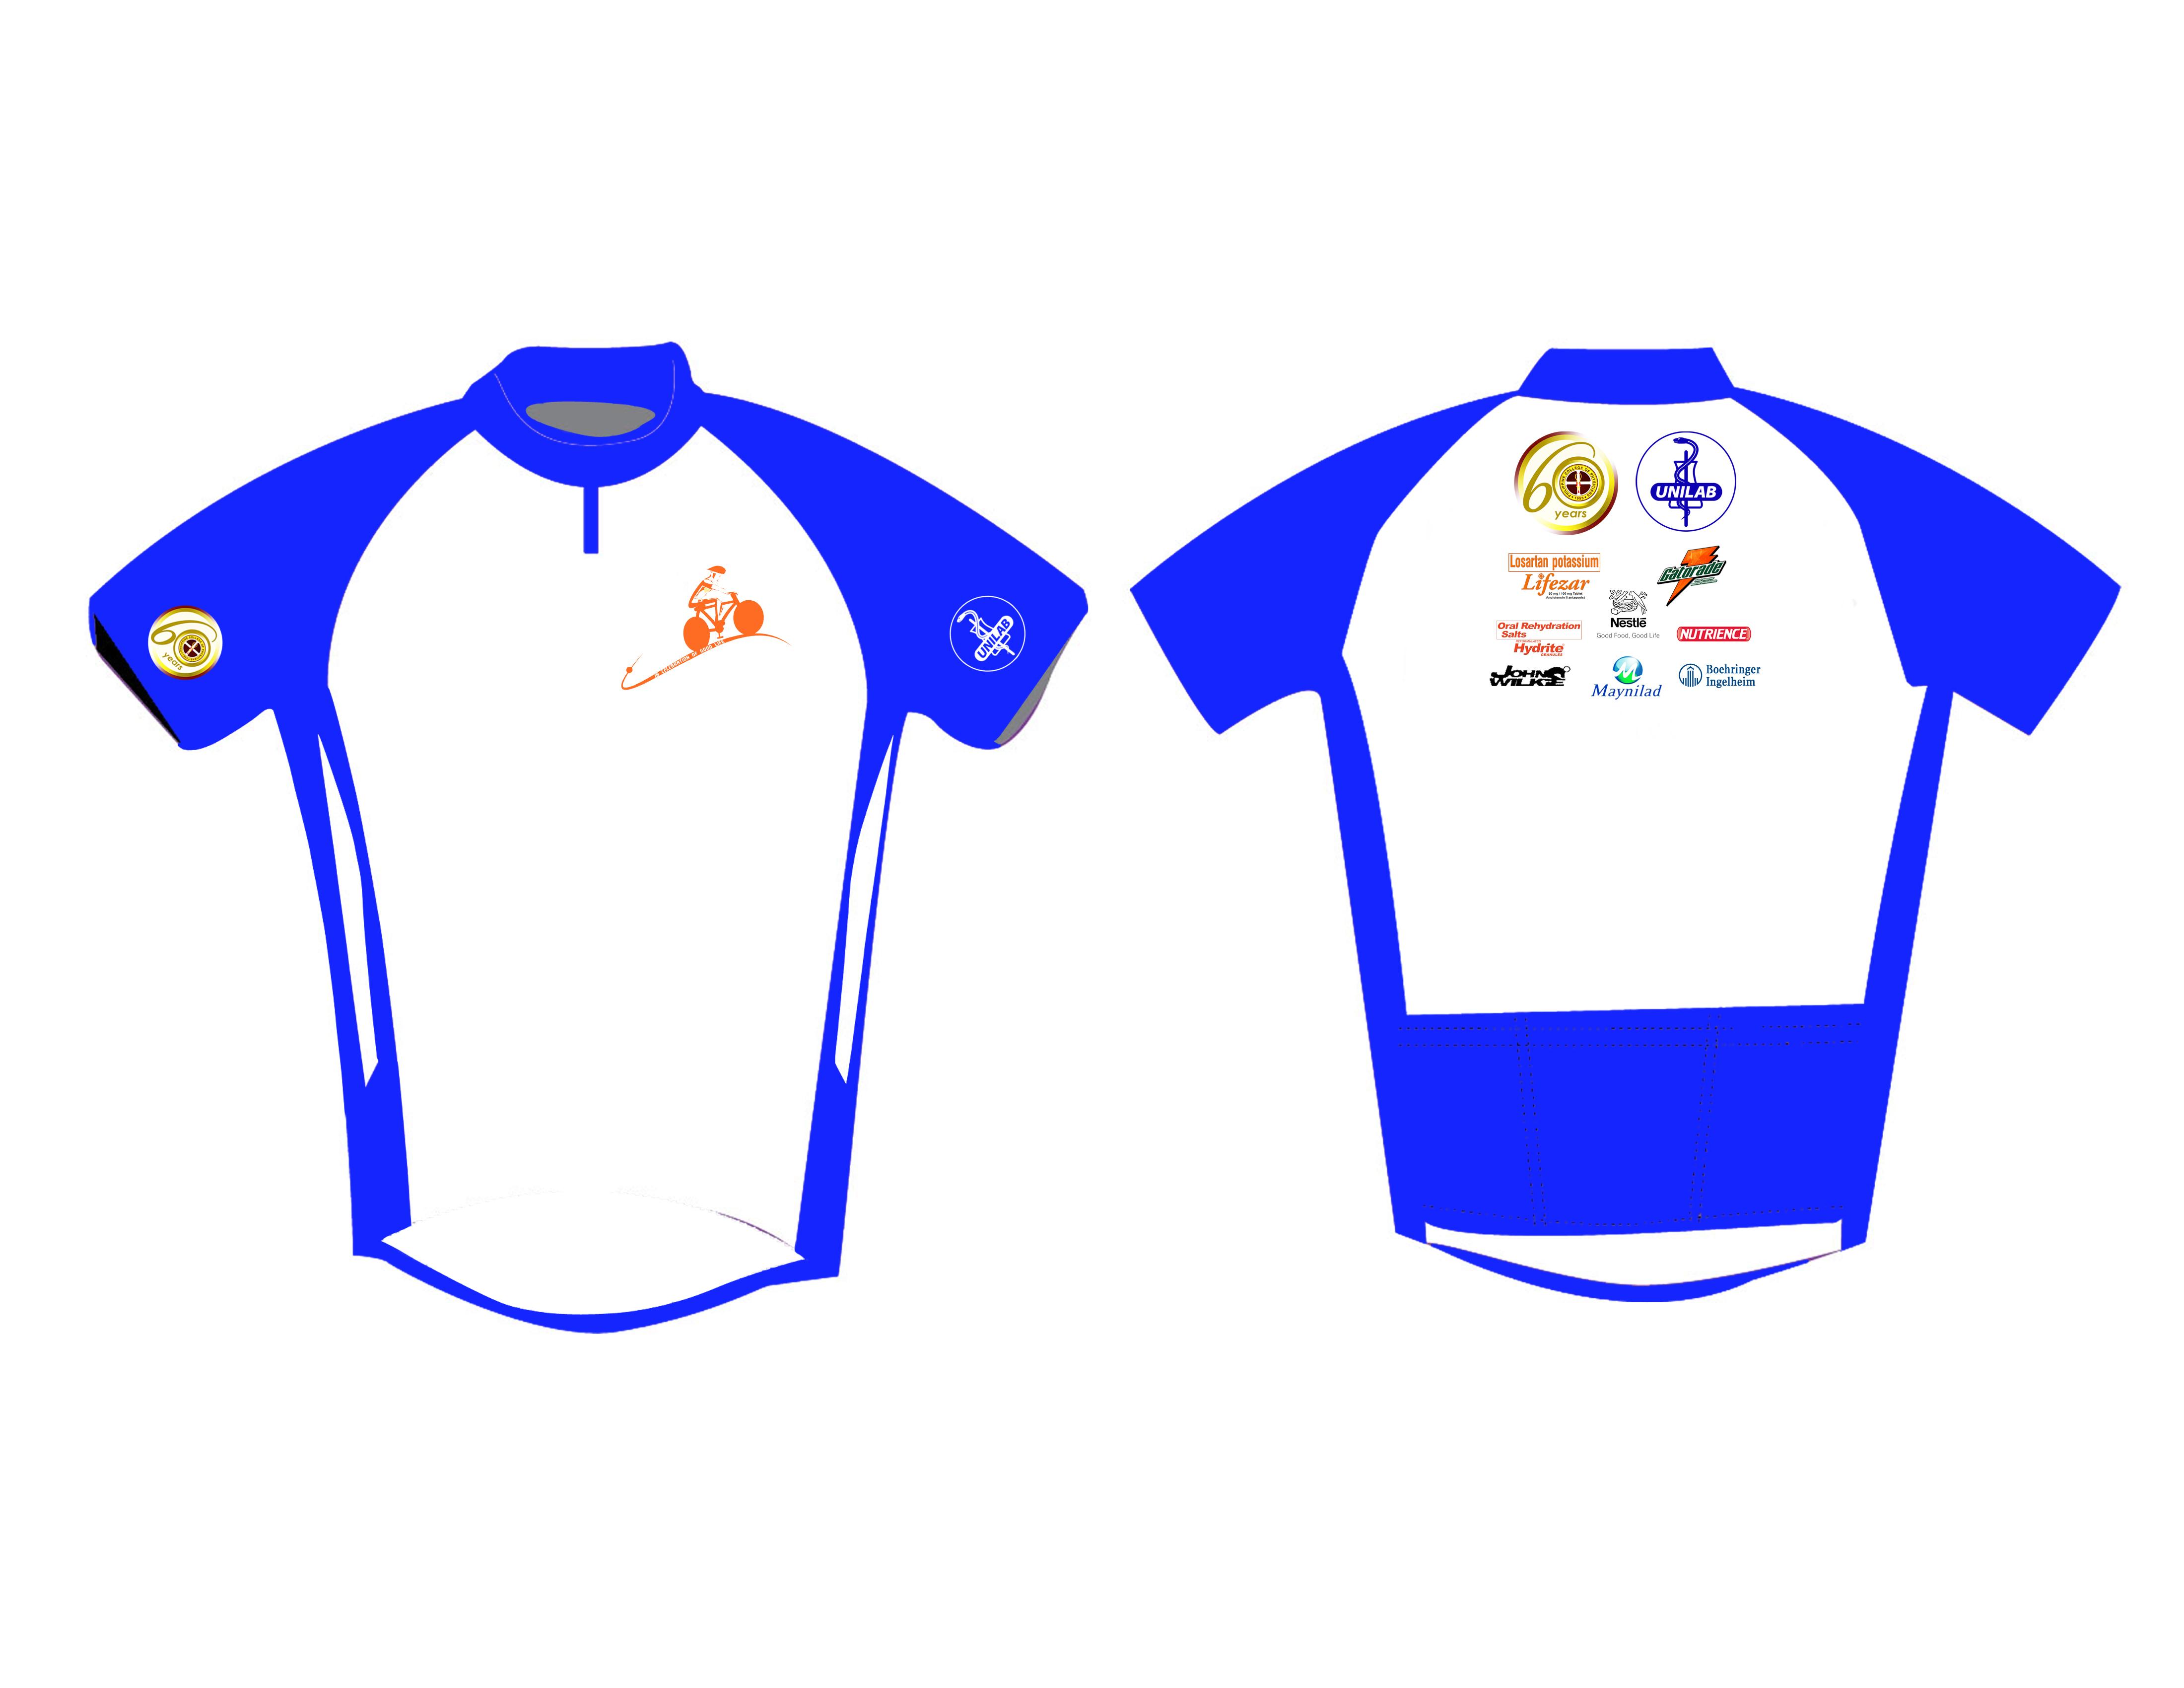 bike-for-health-2013-jersey-design